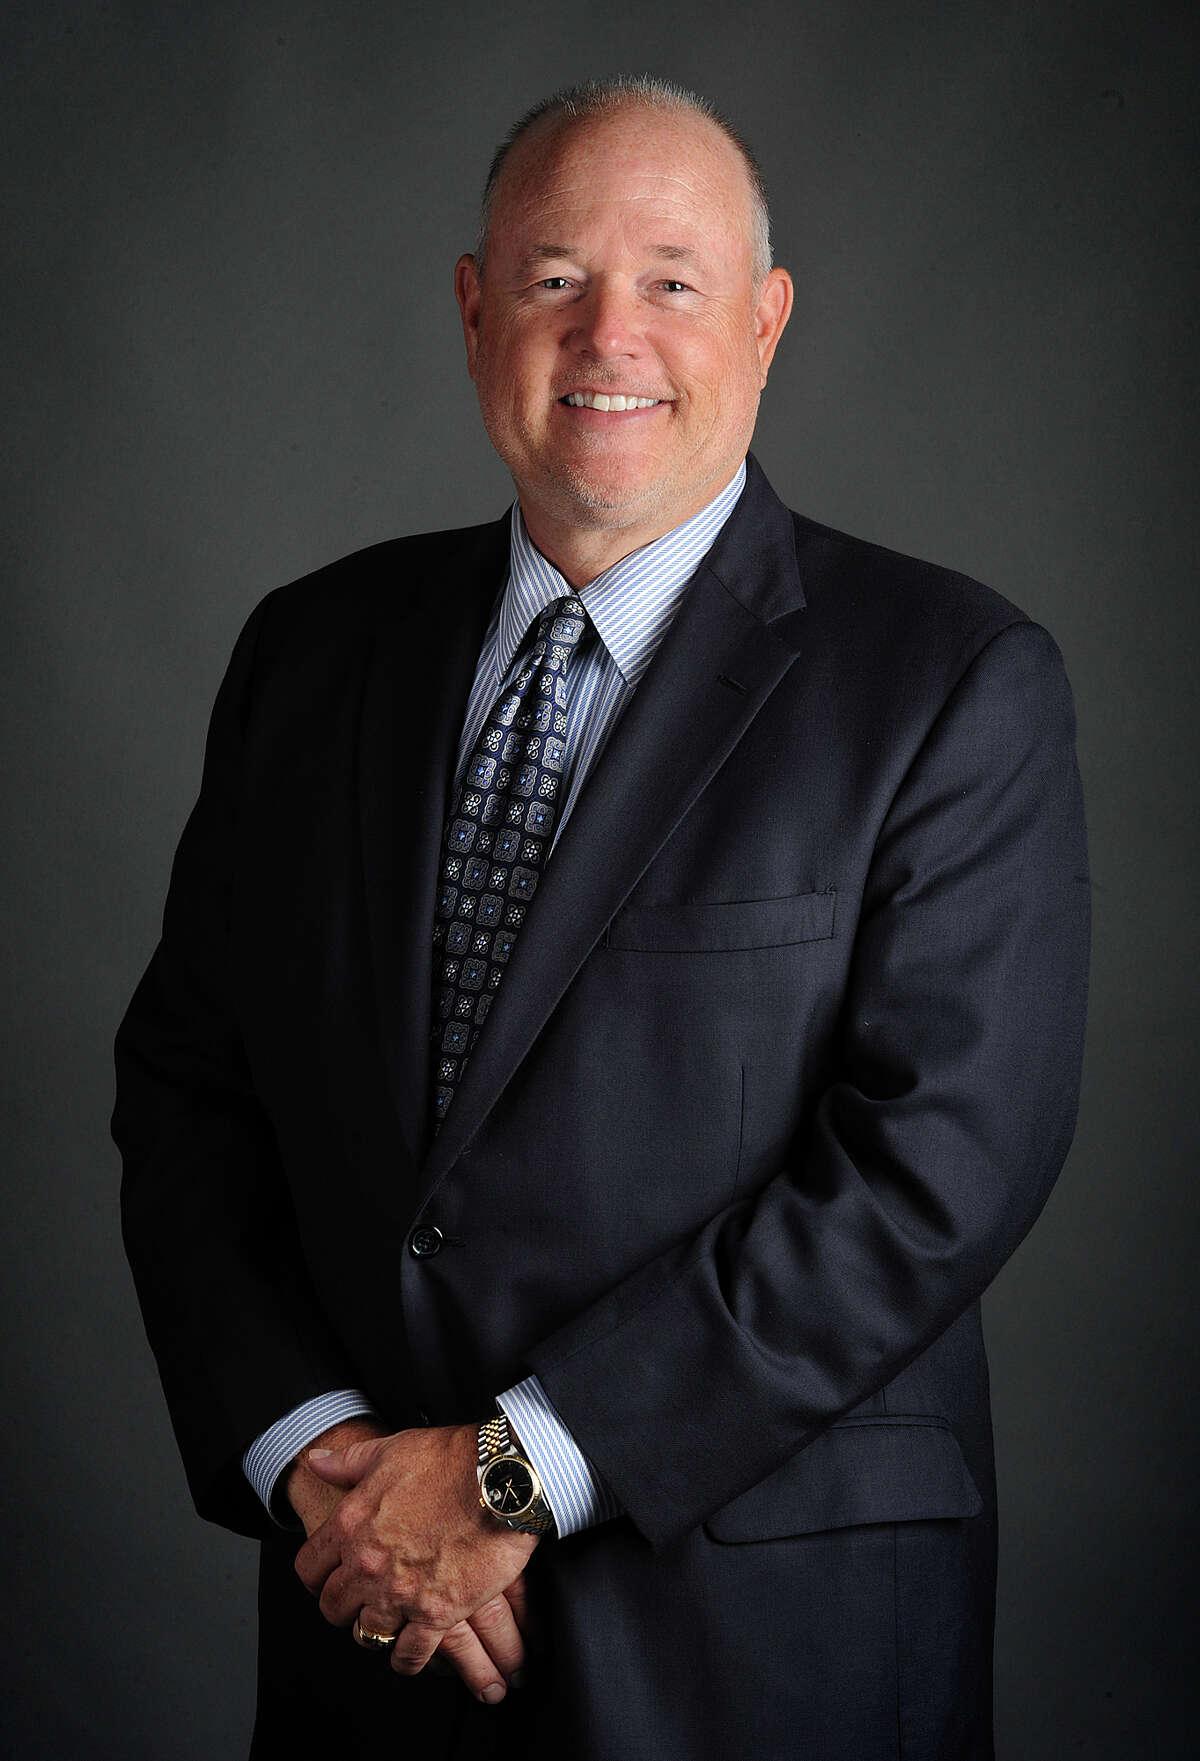 Mark Adkins named Publisher of The Beaumont Enterprise